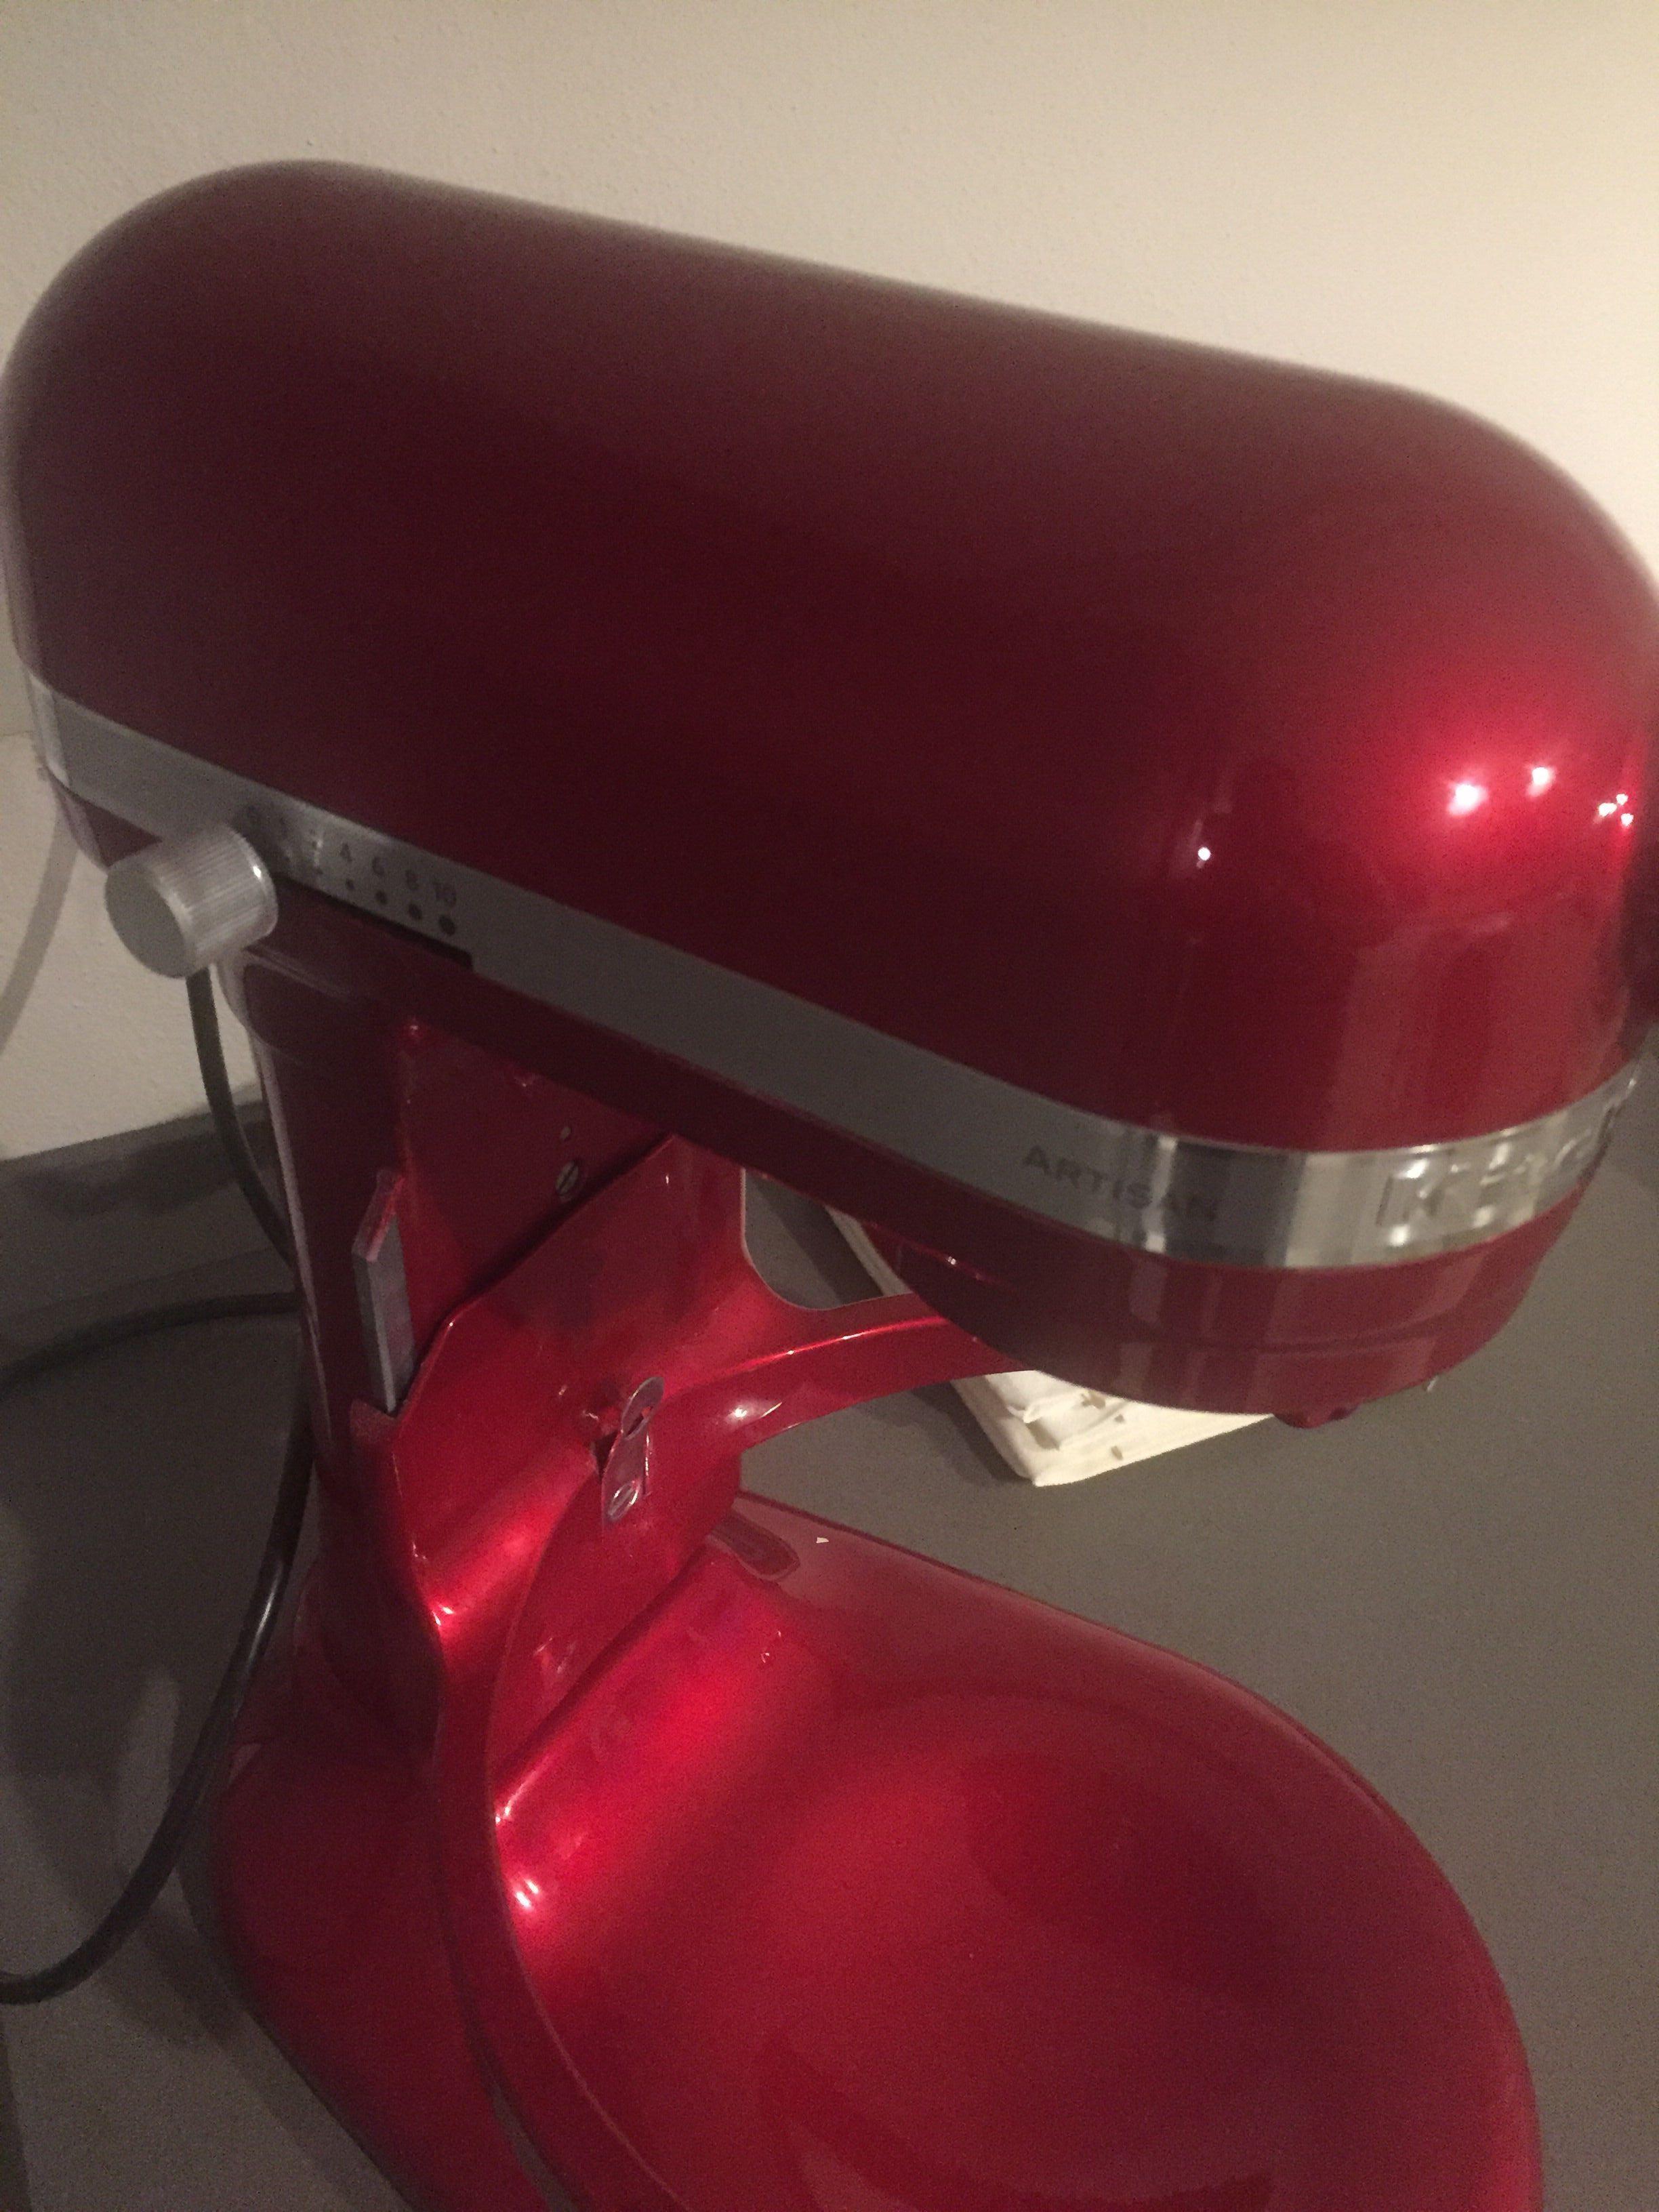 Robot da cucina Artisan da 6,9 Lt Rosso Mela Metallizzato 5KSM7580XECA